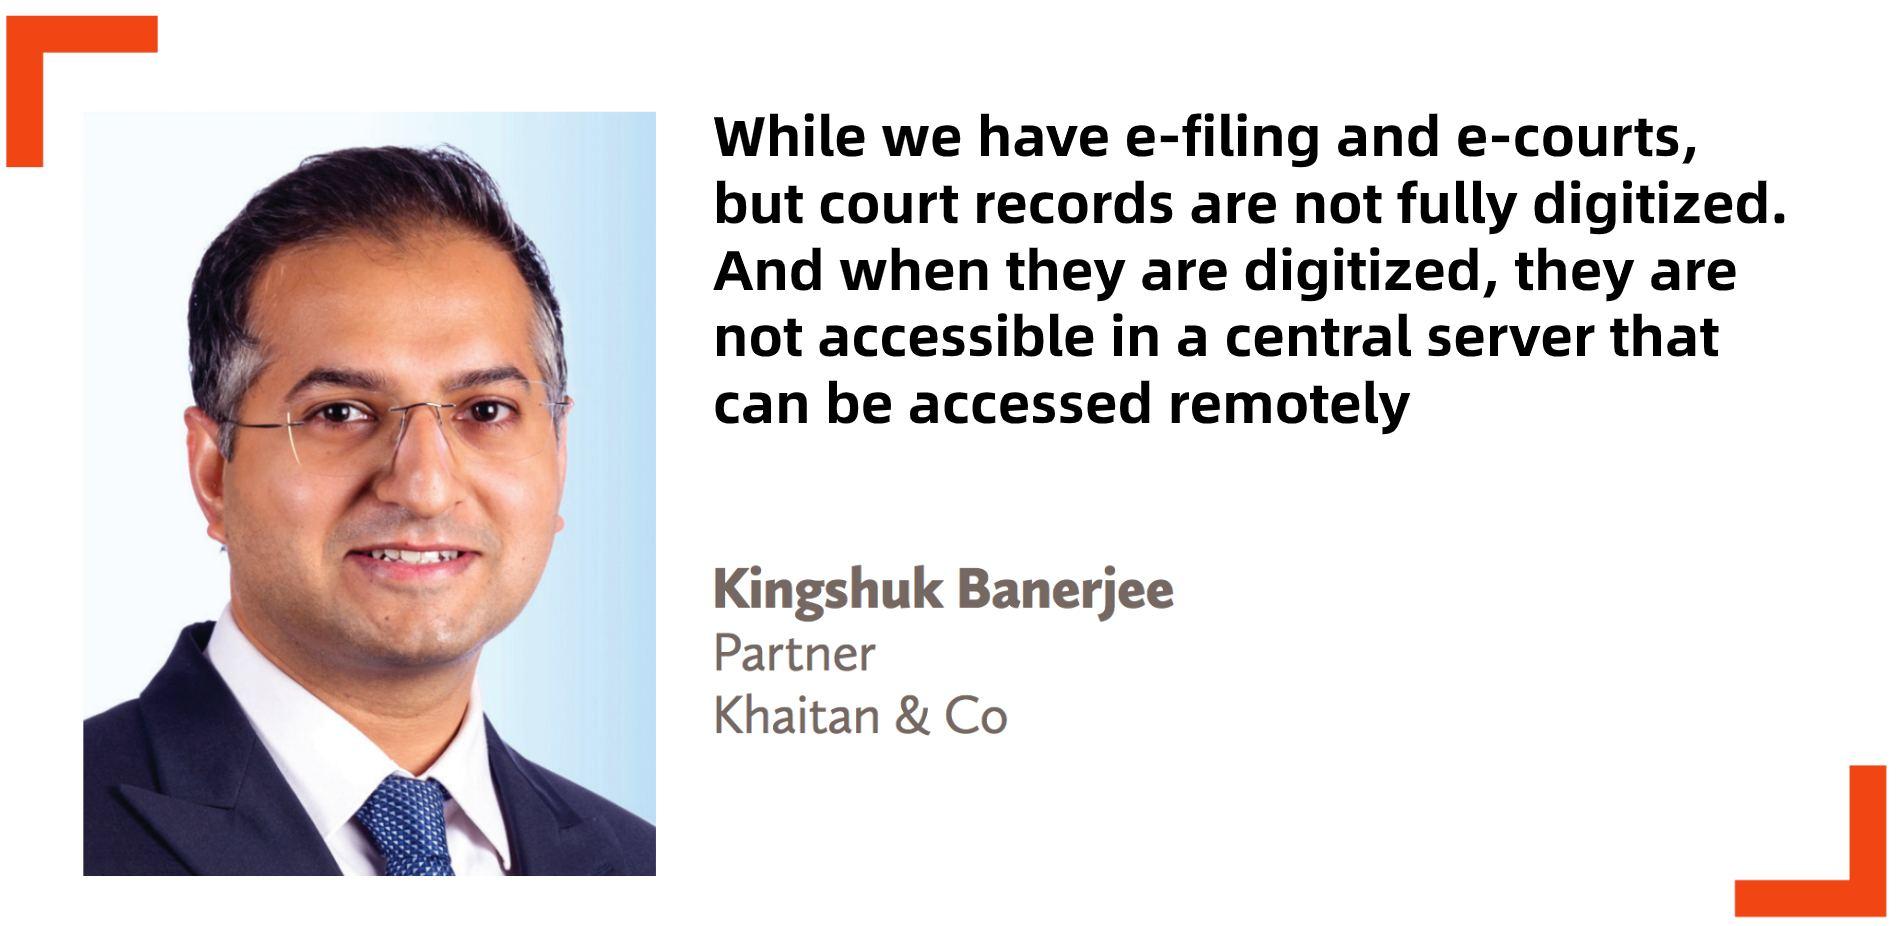 Kingshuk Banerjee Partner Khaitan & Co India virtual court video conference